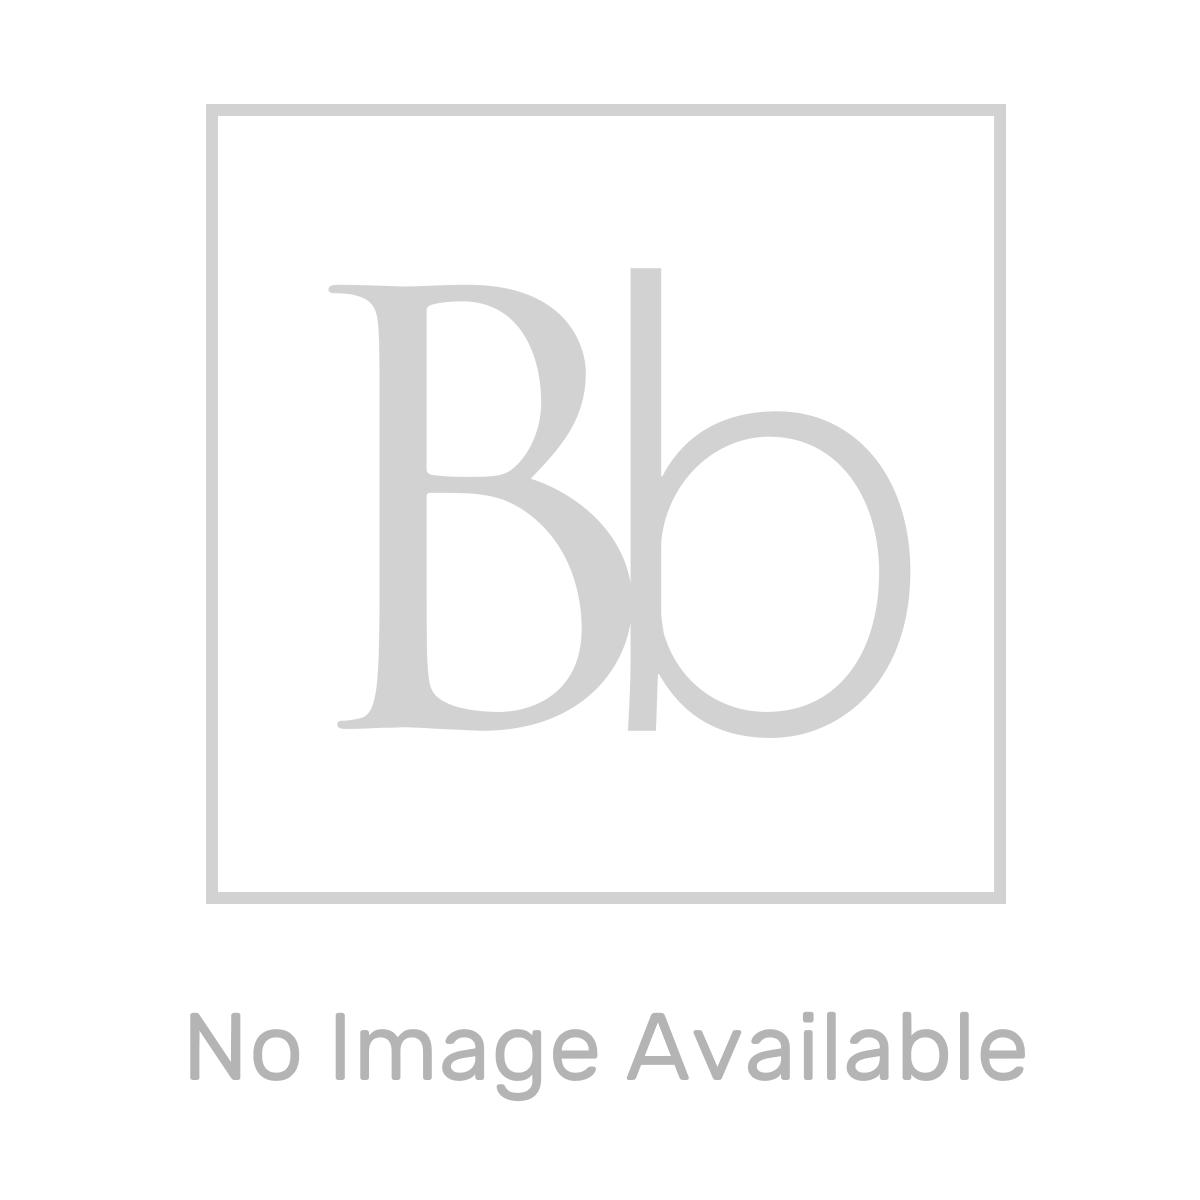 RAK Maremma Grey Matt Tile 600 x 600mm